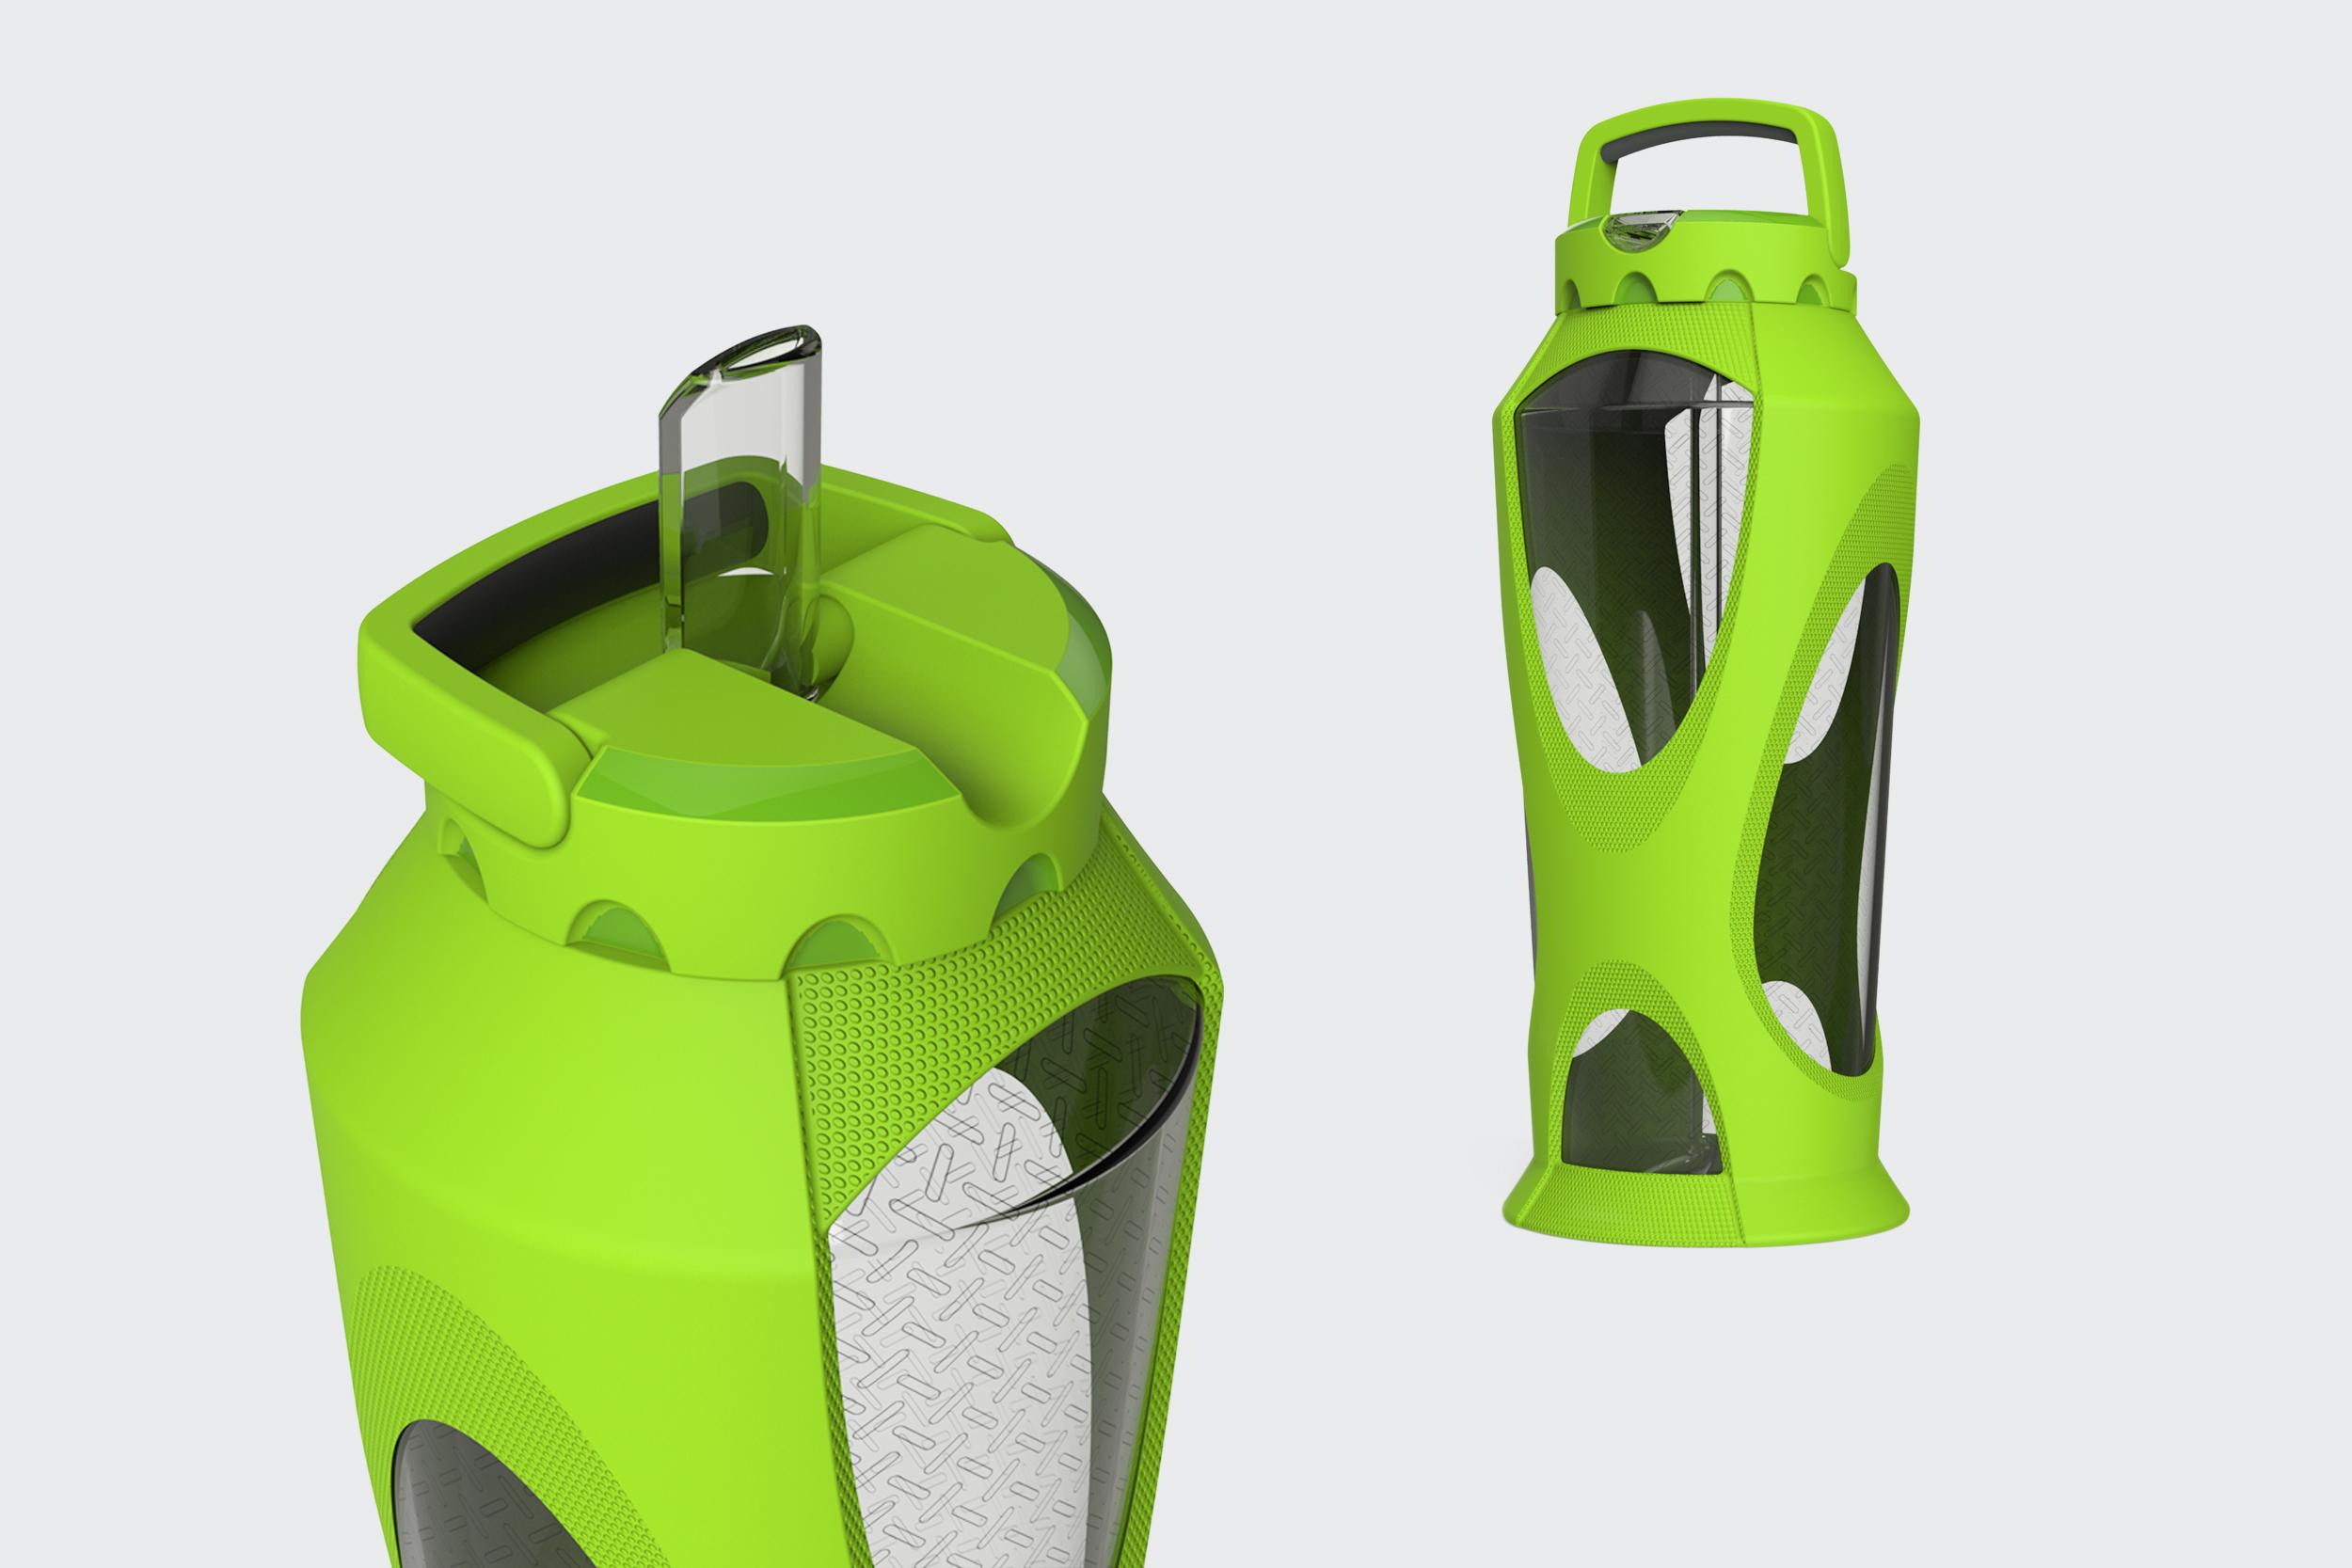 Leapfrog Zulu Water Bottle Concept  |  Product Design